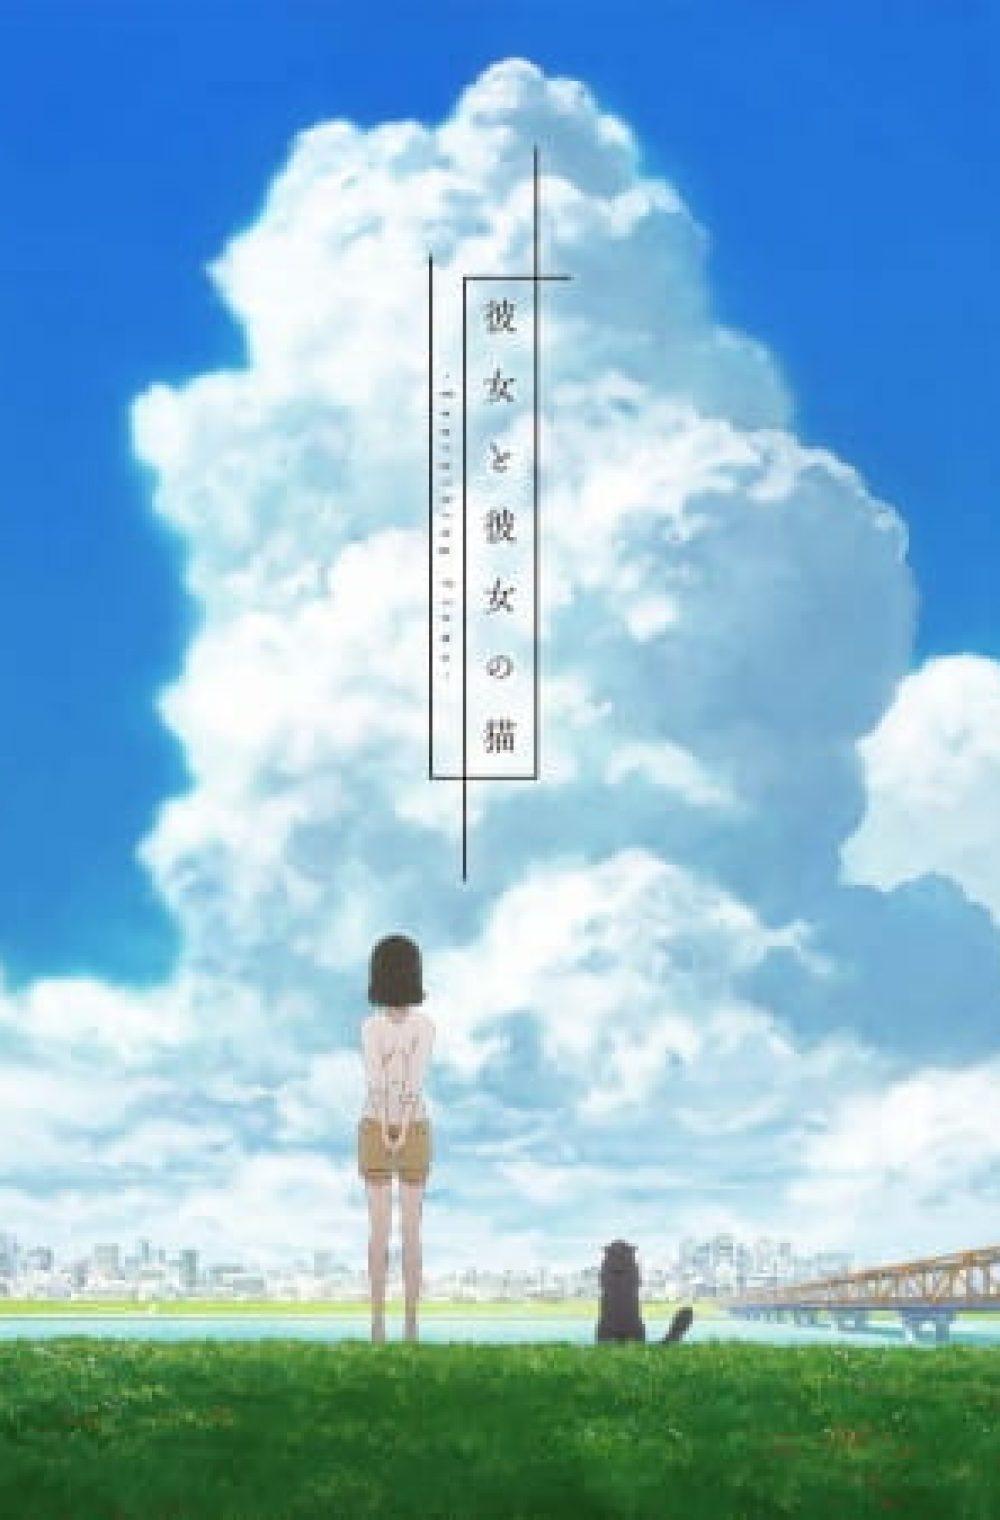 Kanojo to Kanojo no Neko: Everything Flows (DIRECTOR'S CUT)